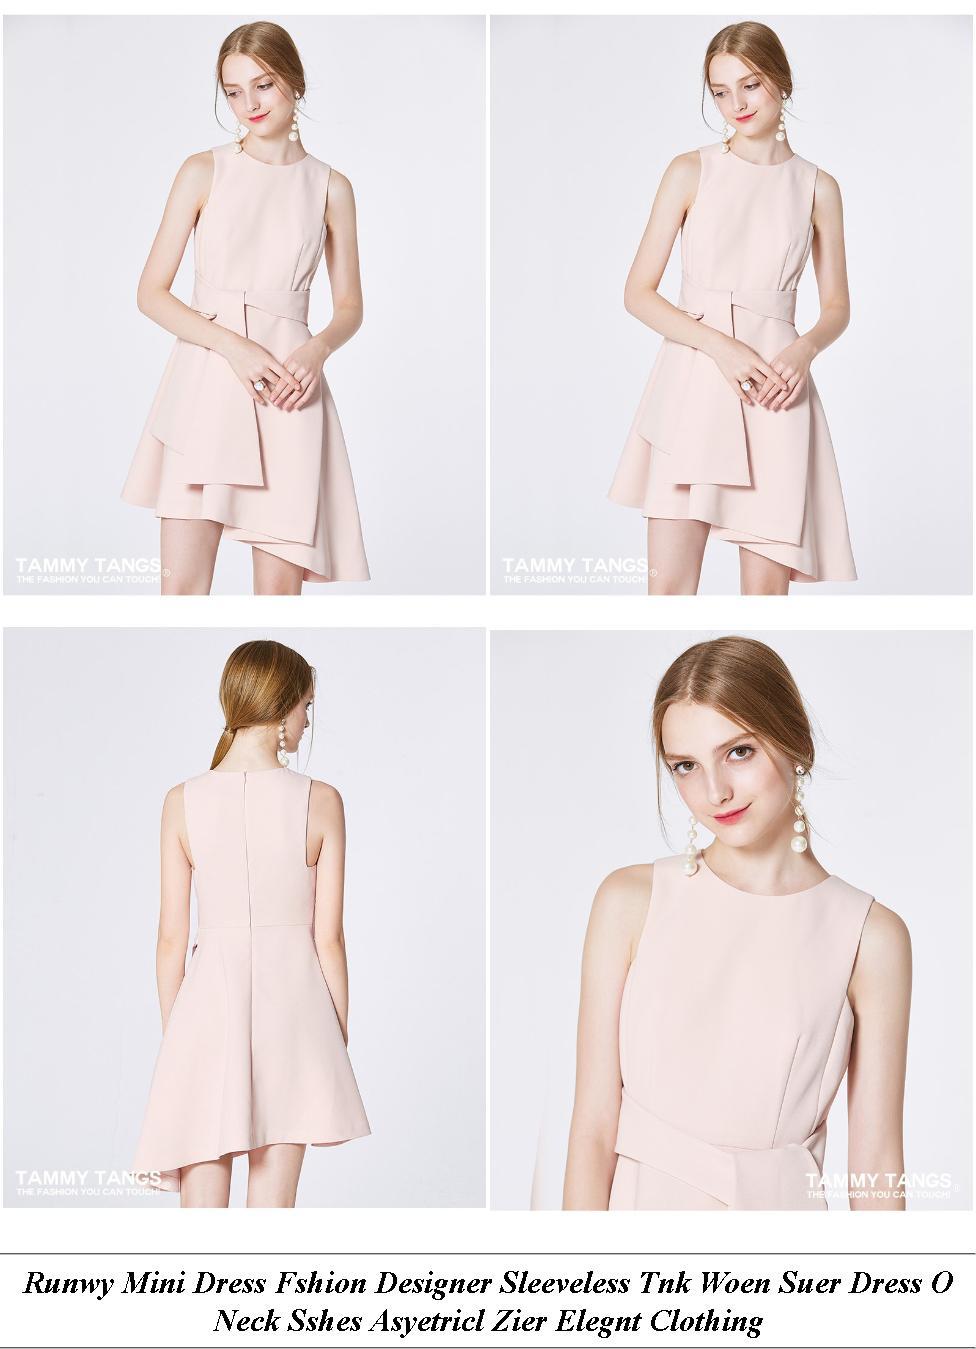 Plus Size Dresses Toronto Area - Greatest Online Sale India - Work Dresses Canada